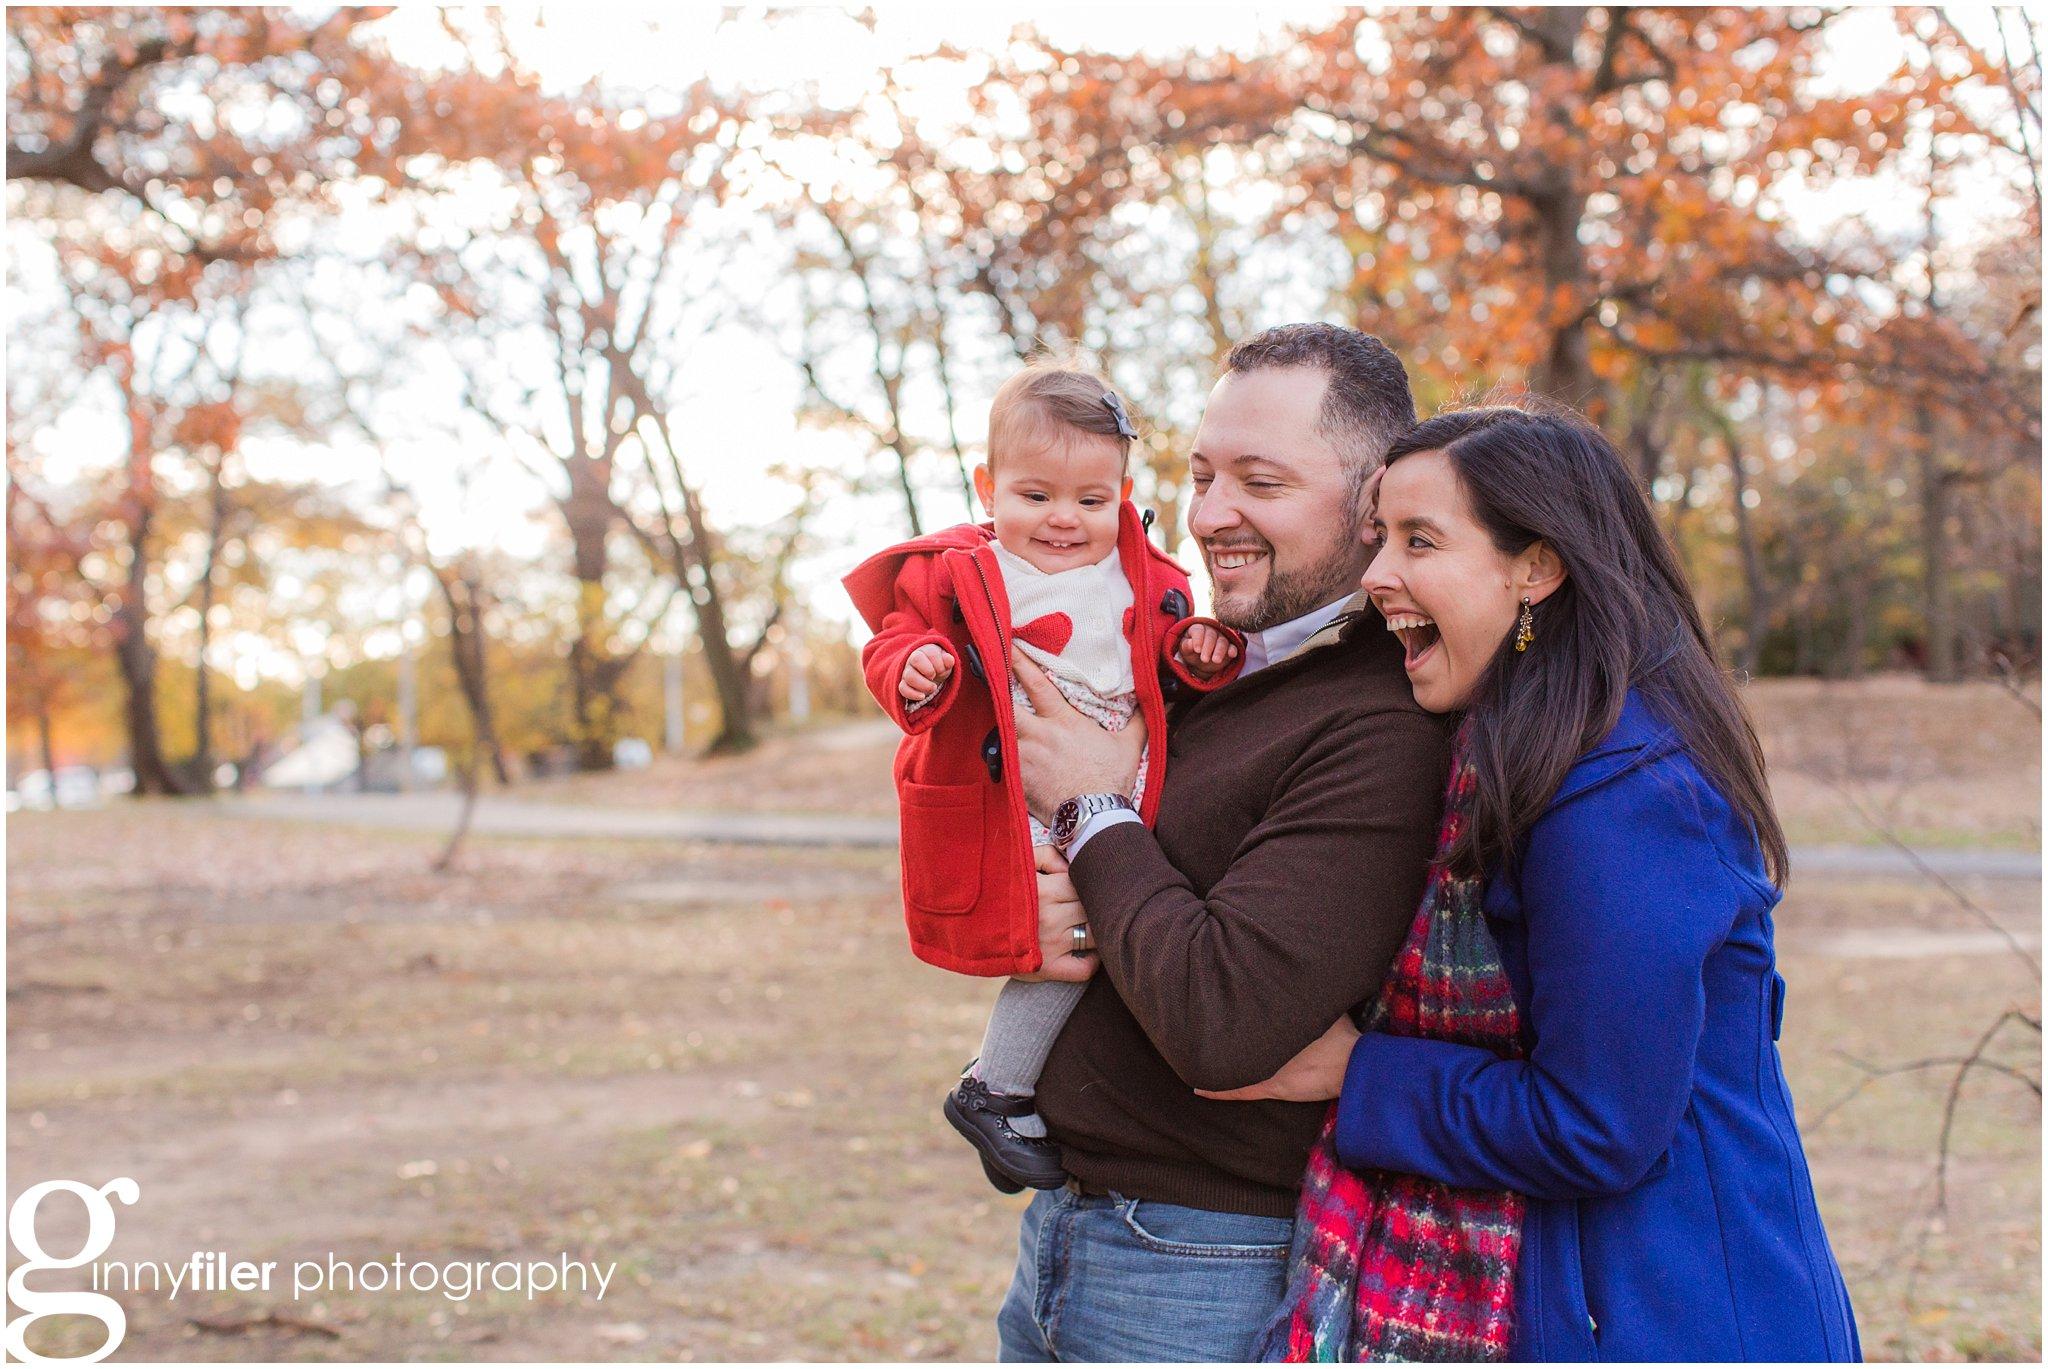 family_photography_Sanchez_0008.jpg